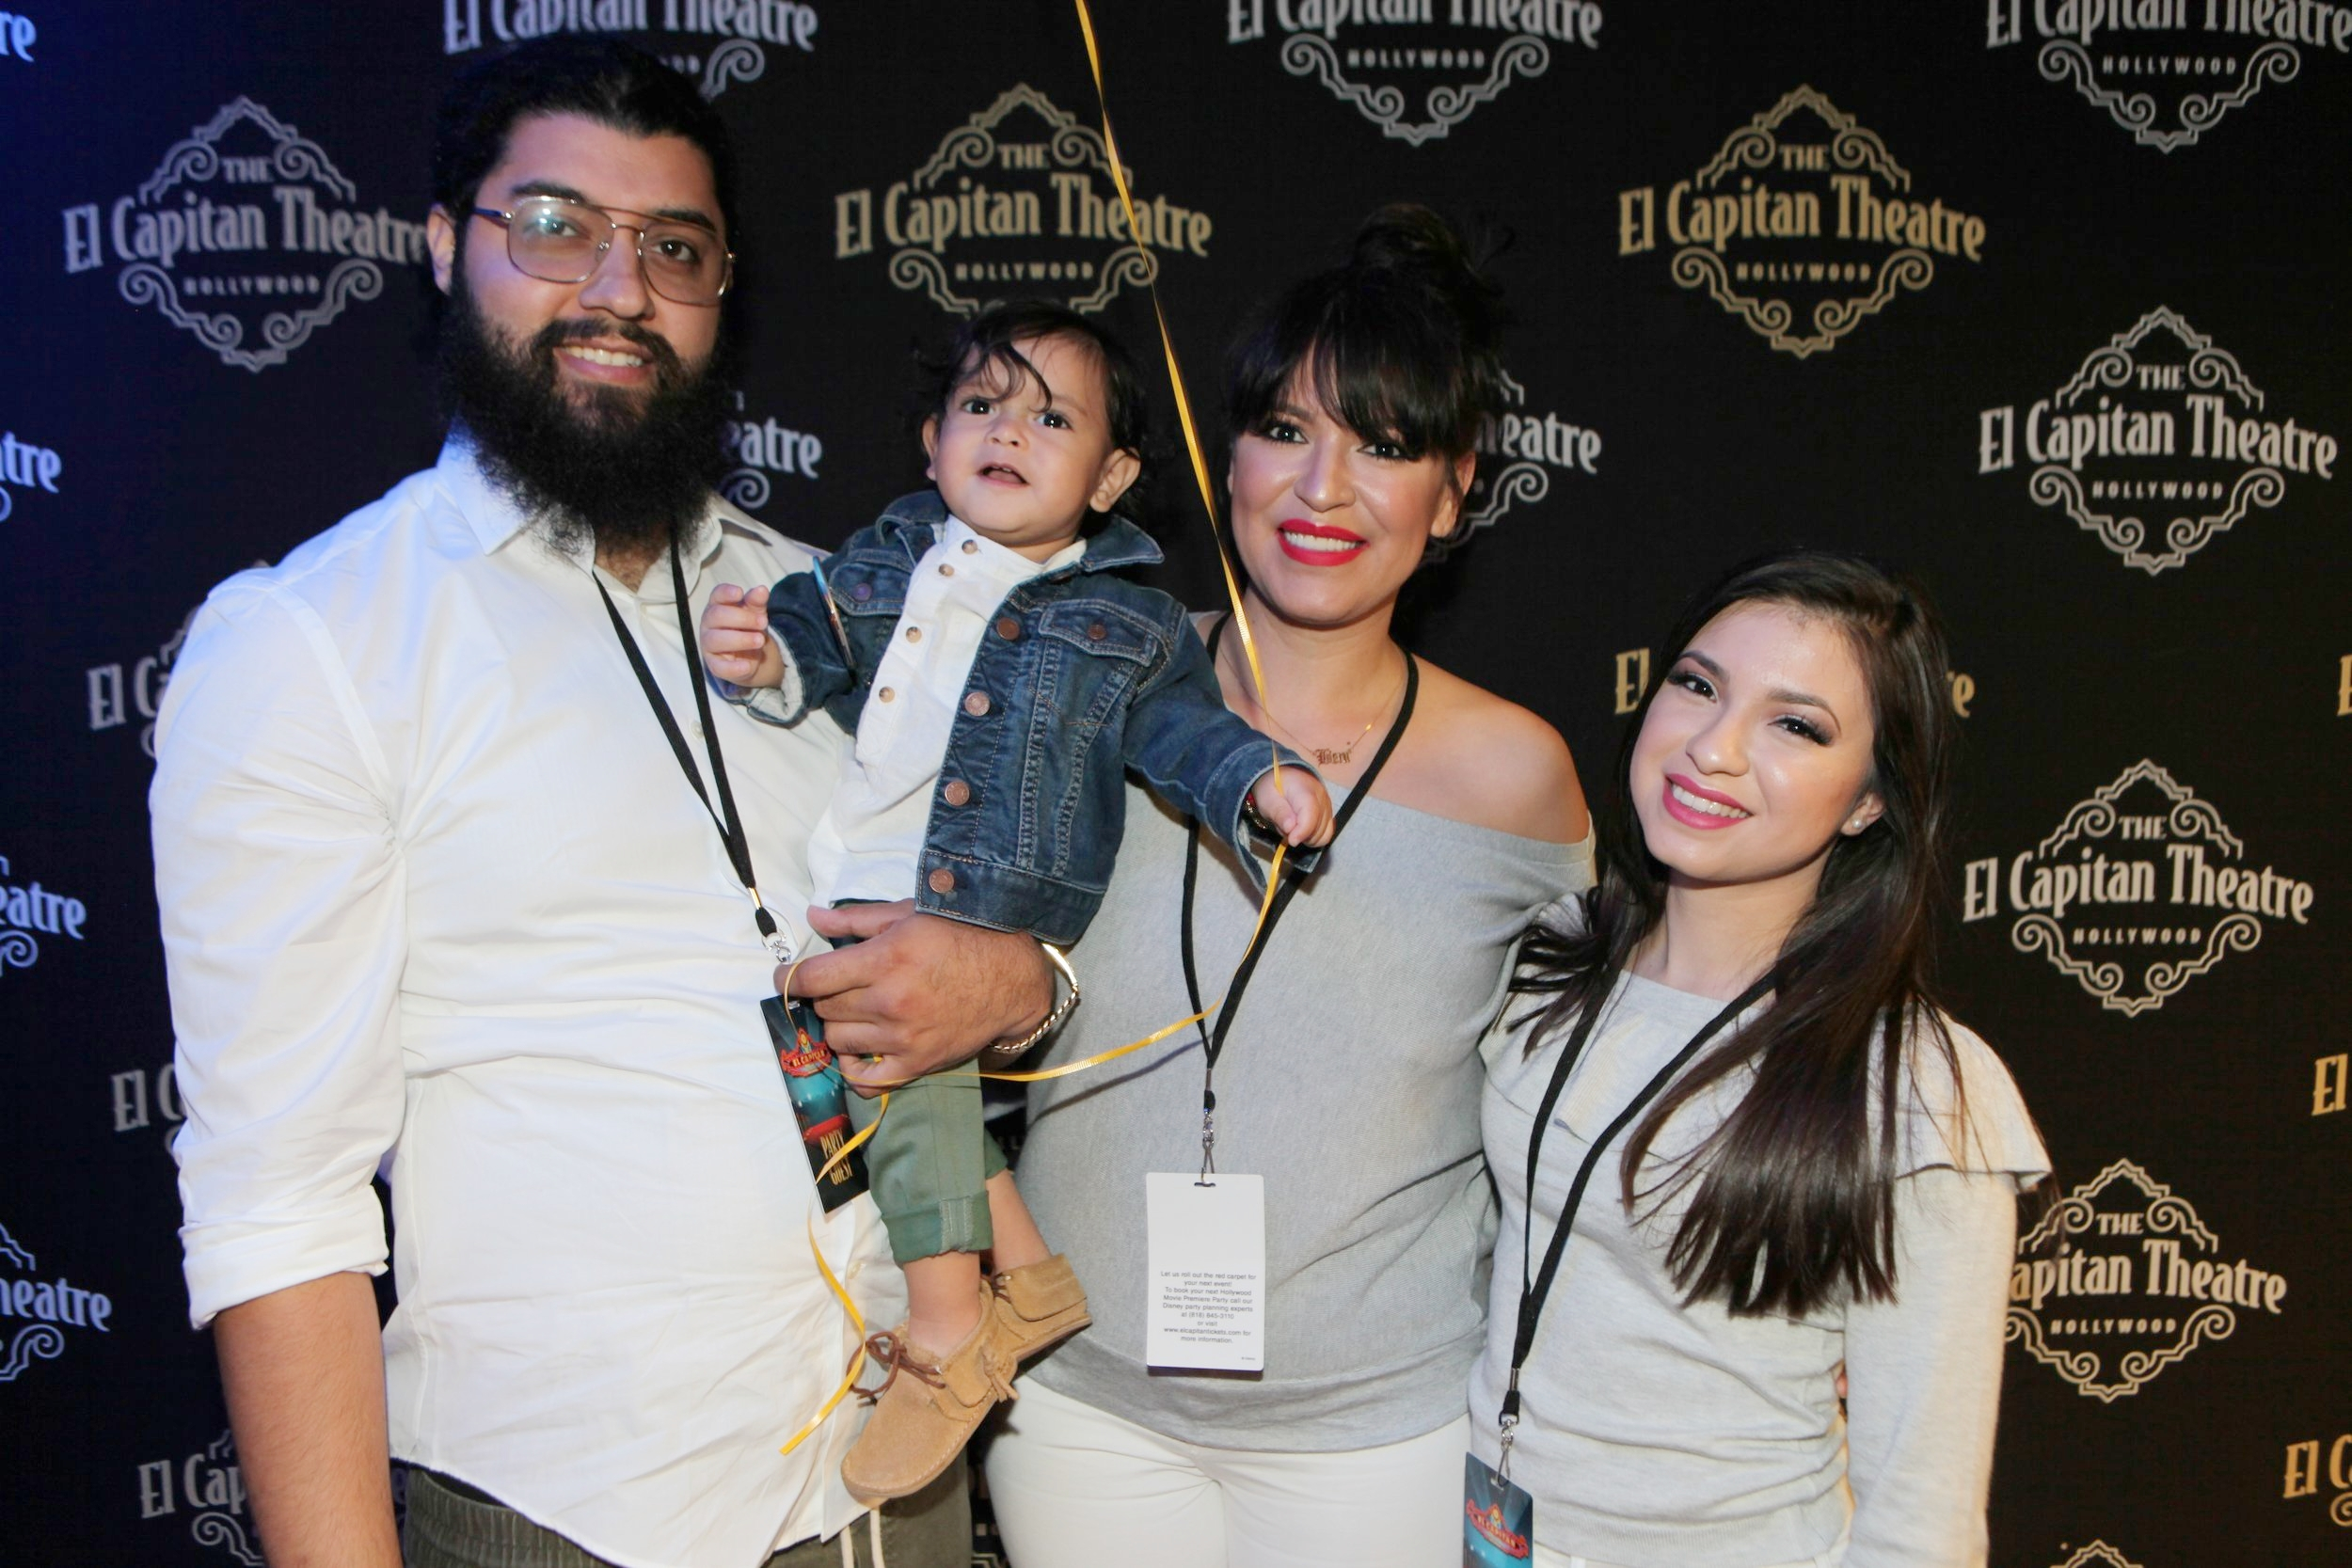 From L to R, Alfonso (Luz' boyfriend), their son Beni, Luz Warrior and daughter Elizabeth.